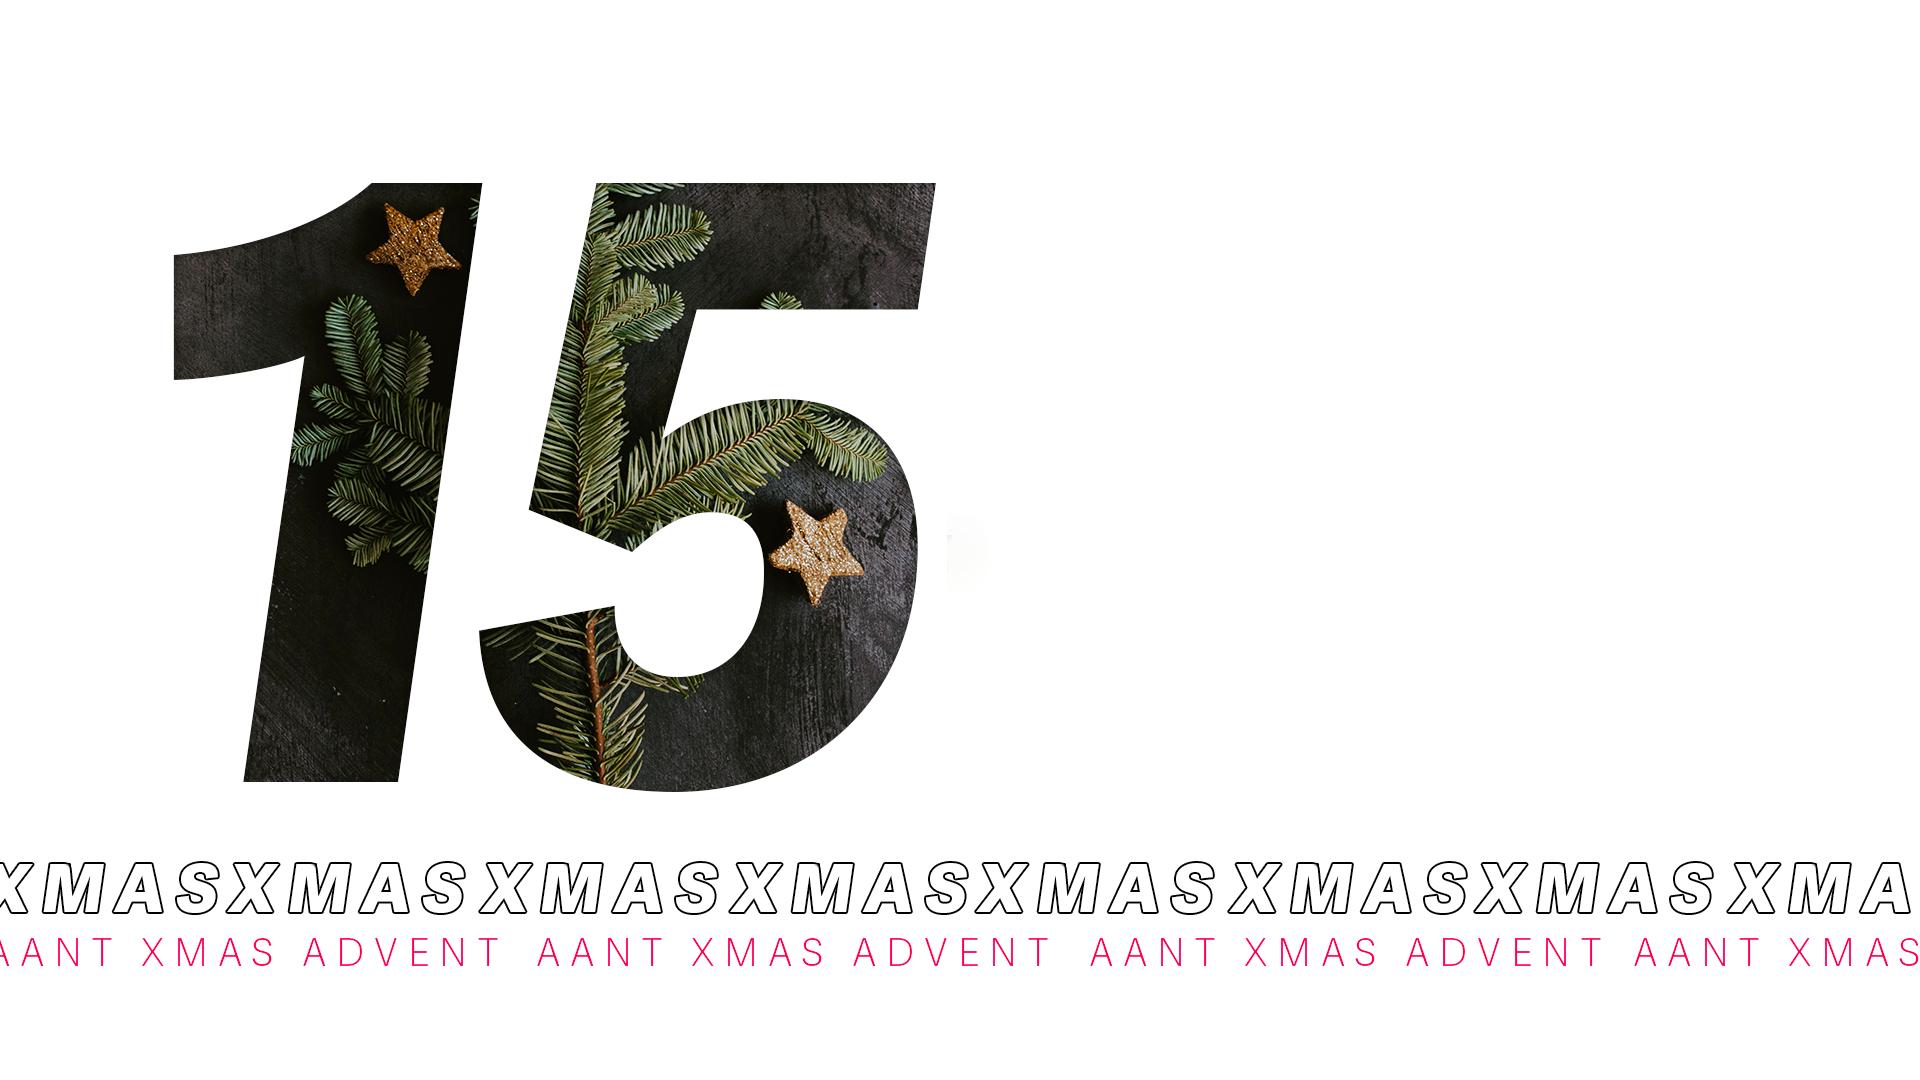 AANT XMAS ADVENT – 15 DICEMBRE